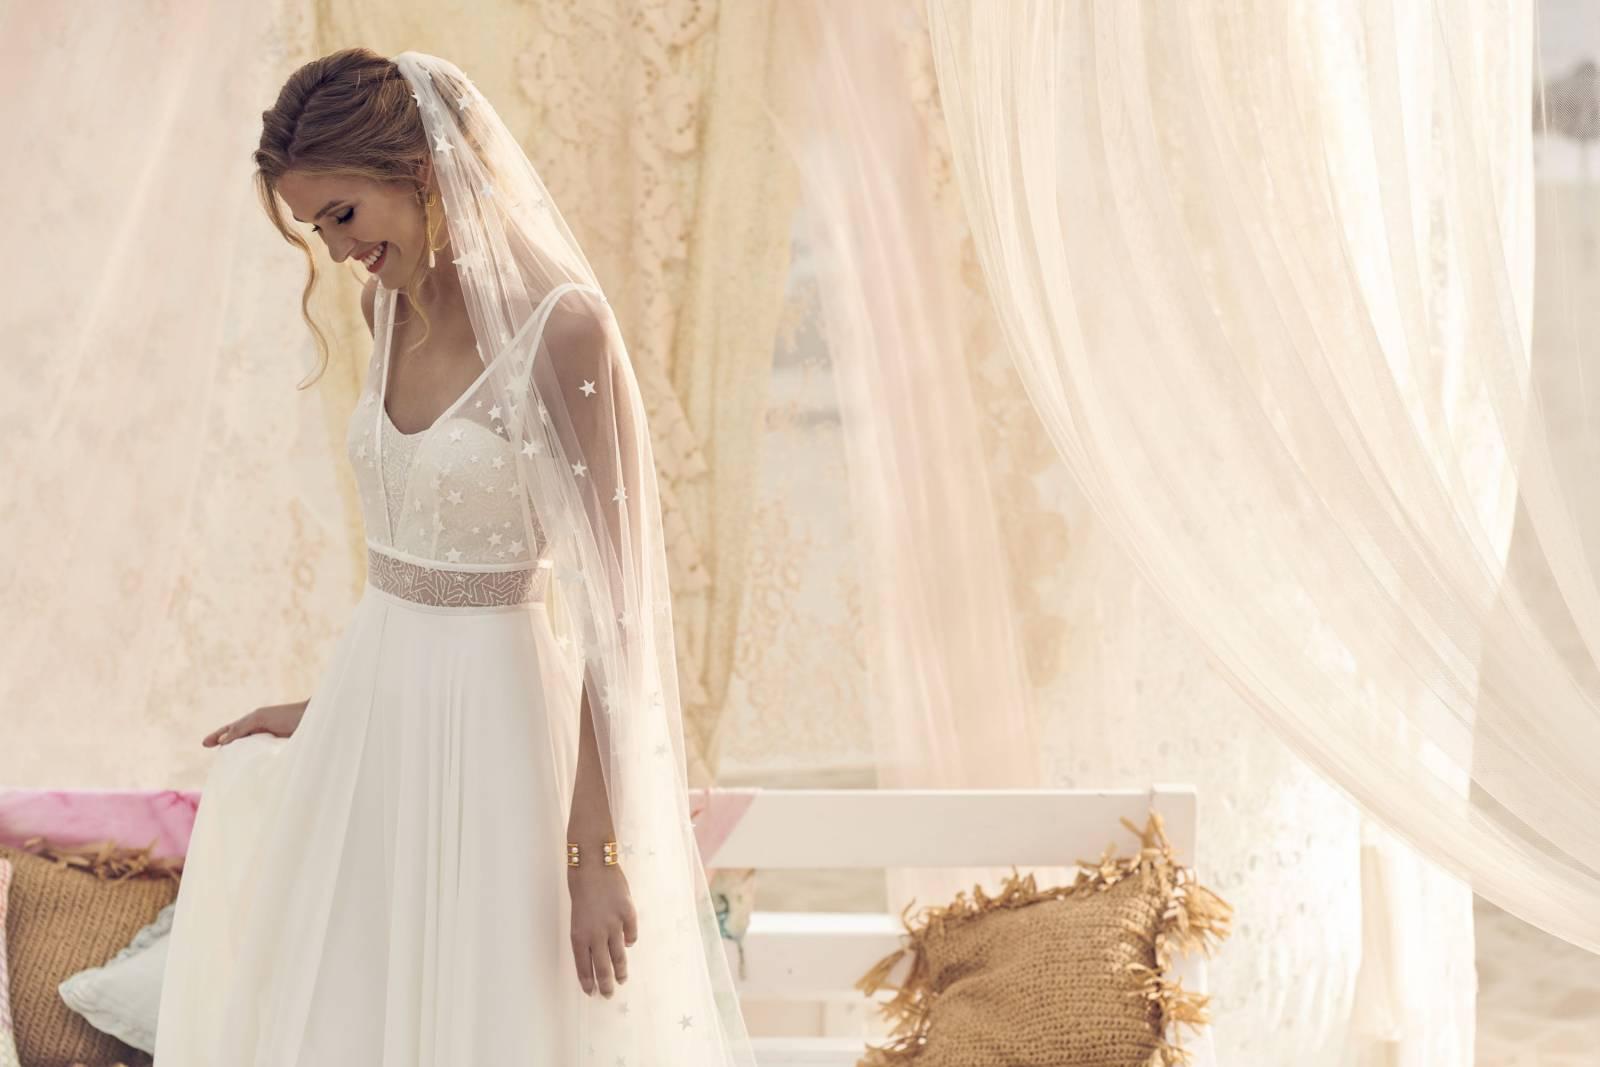 Maxim's Couture - Bruidsmode - Bruidsmodewinkel - Trouwjurk - House of Weddings - 16